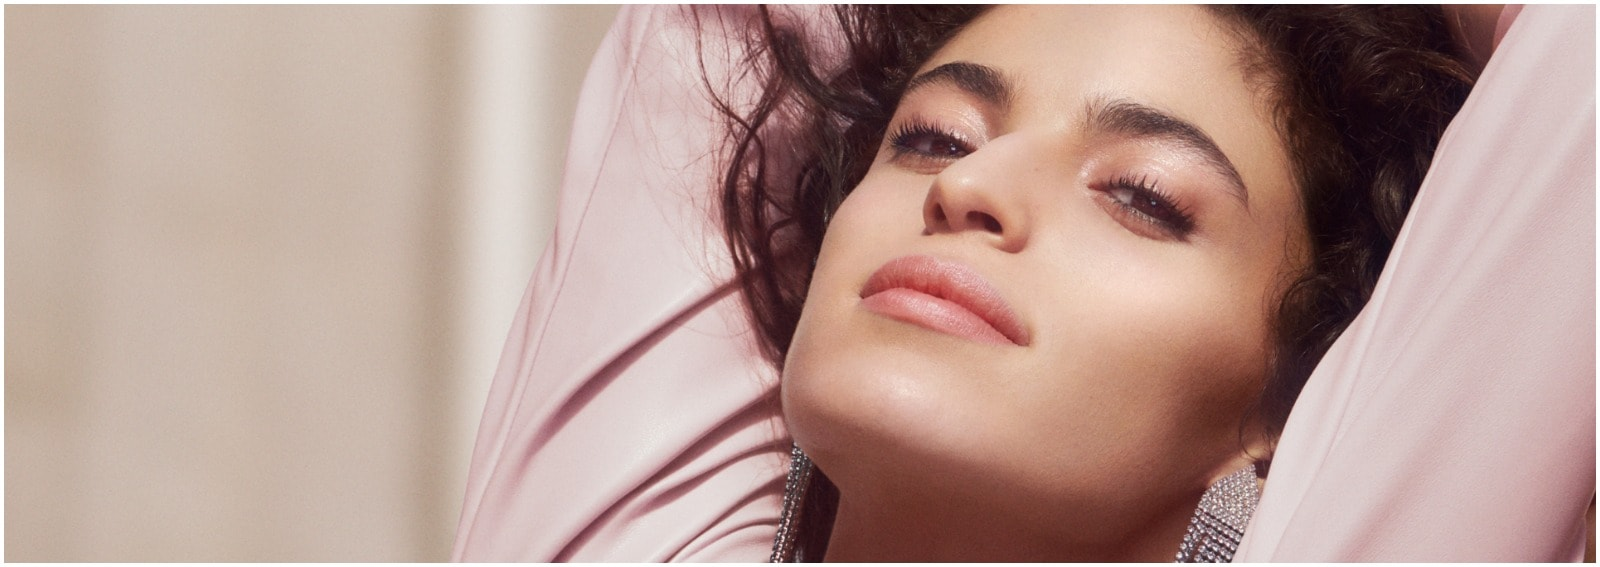 make-up-novita-da-provare-primavera-estate-2021-cover desktop